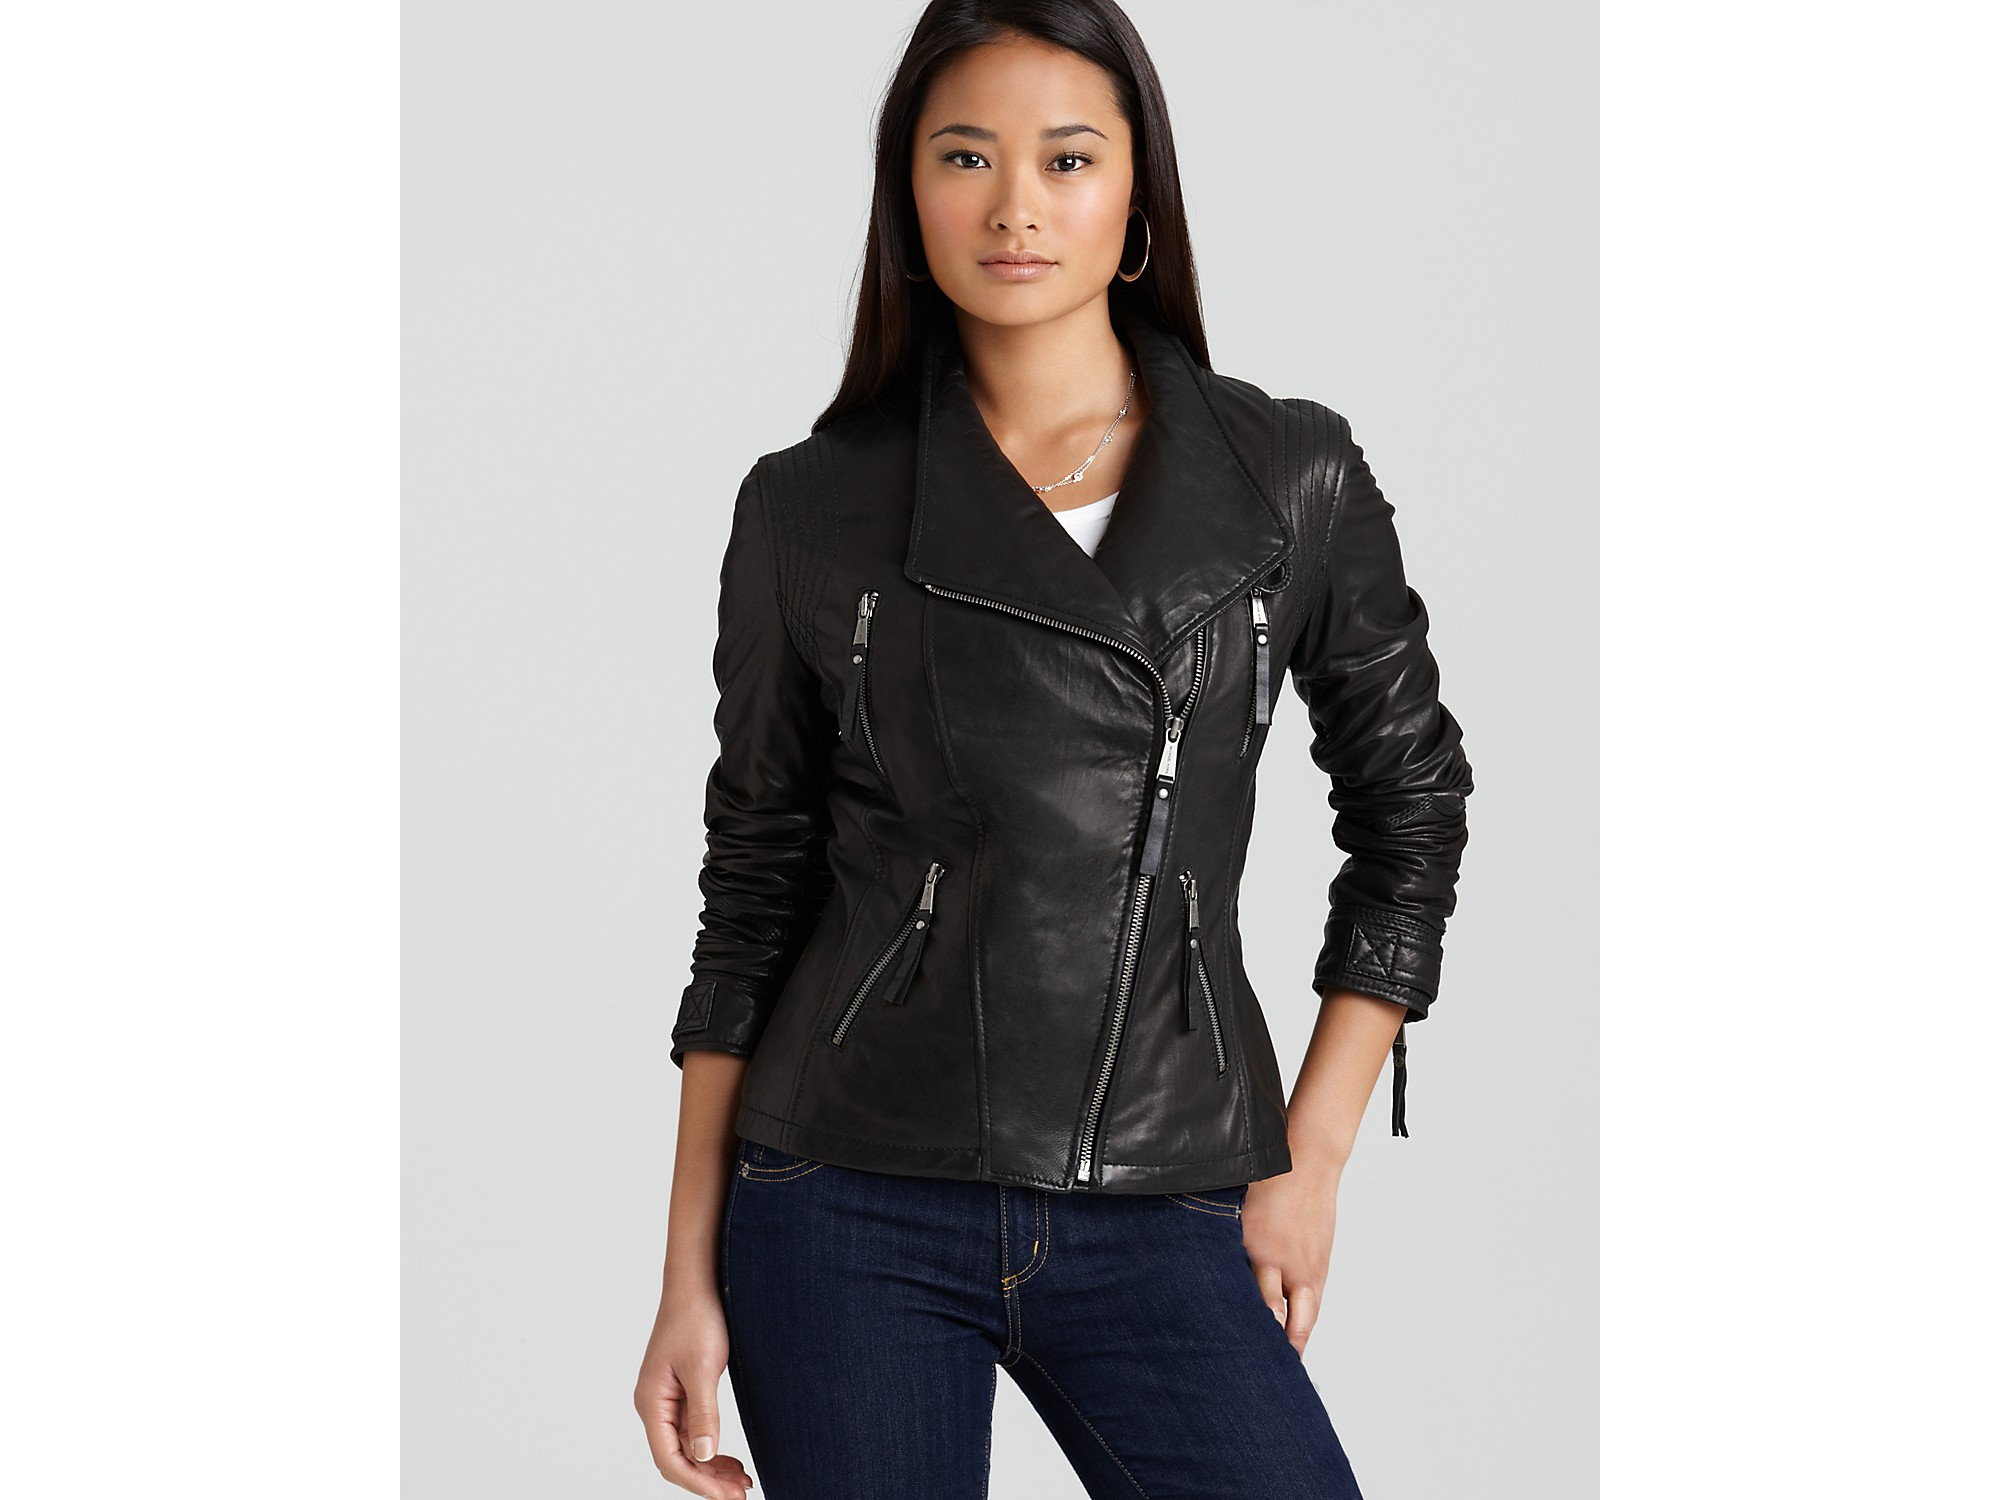 Michael kors black leather jacket women